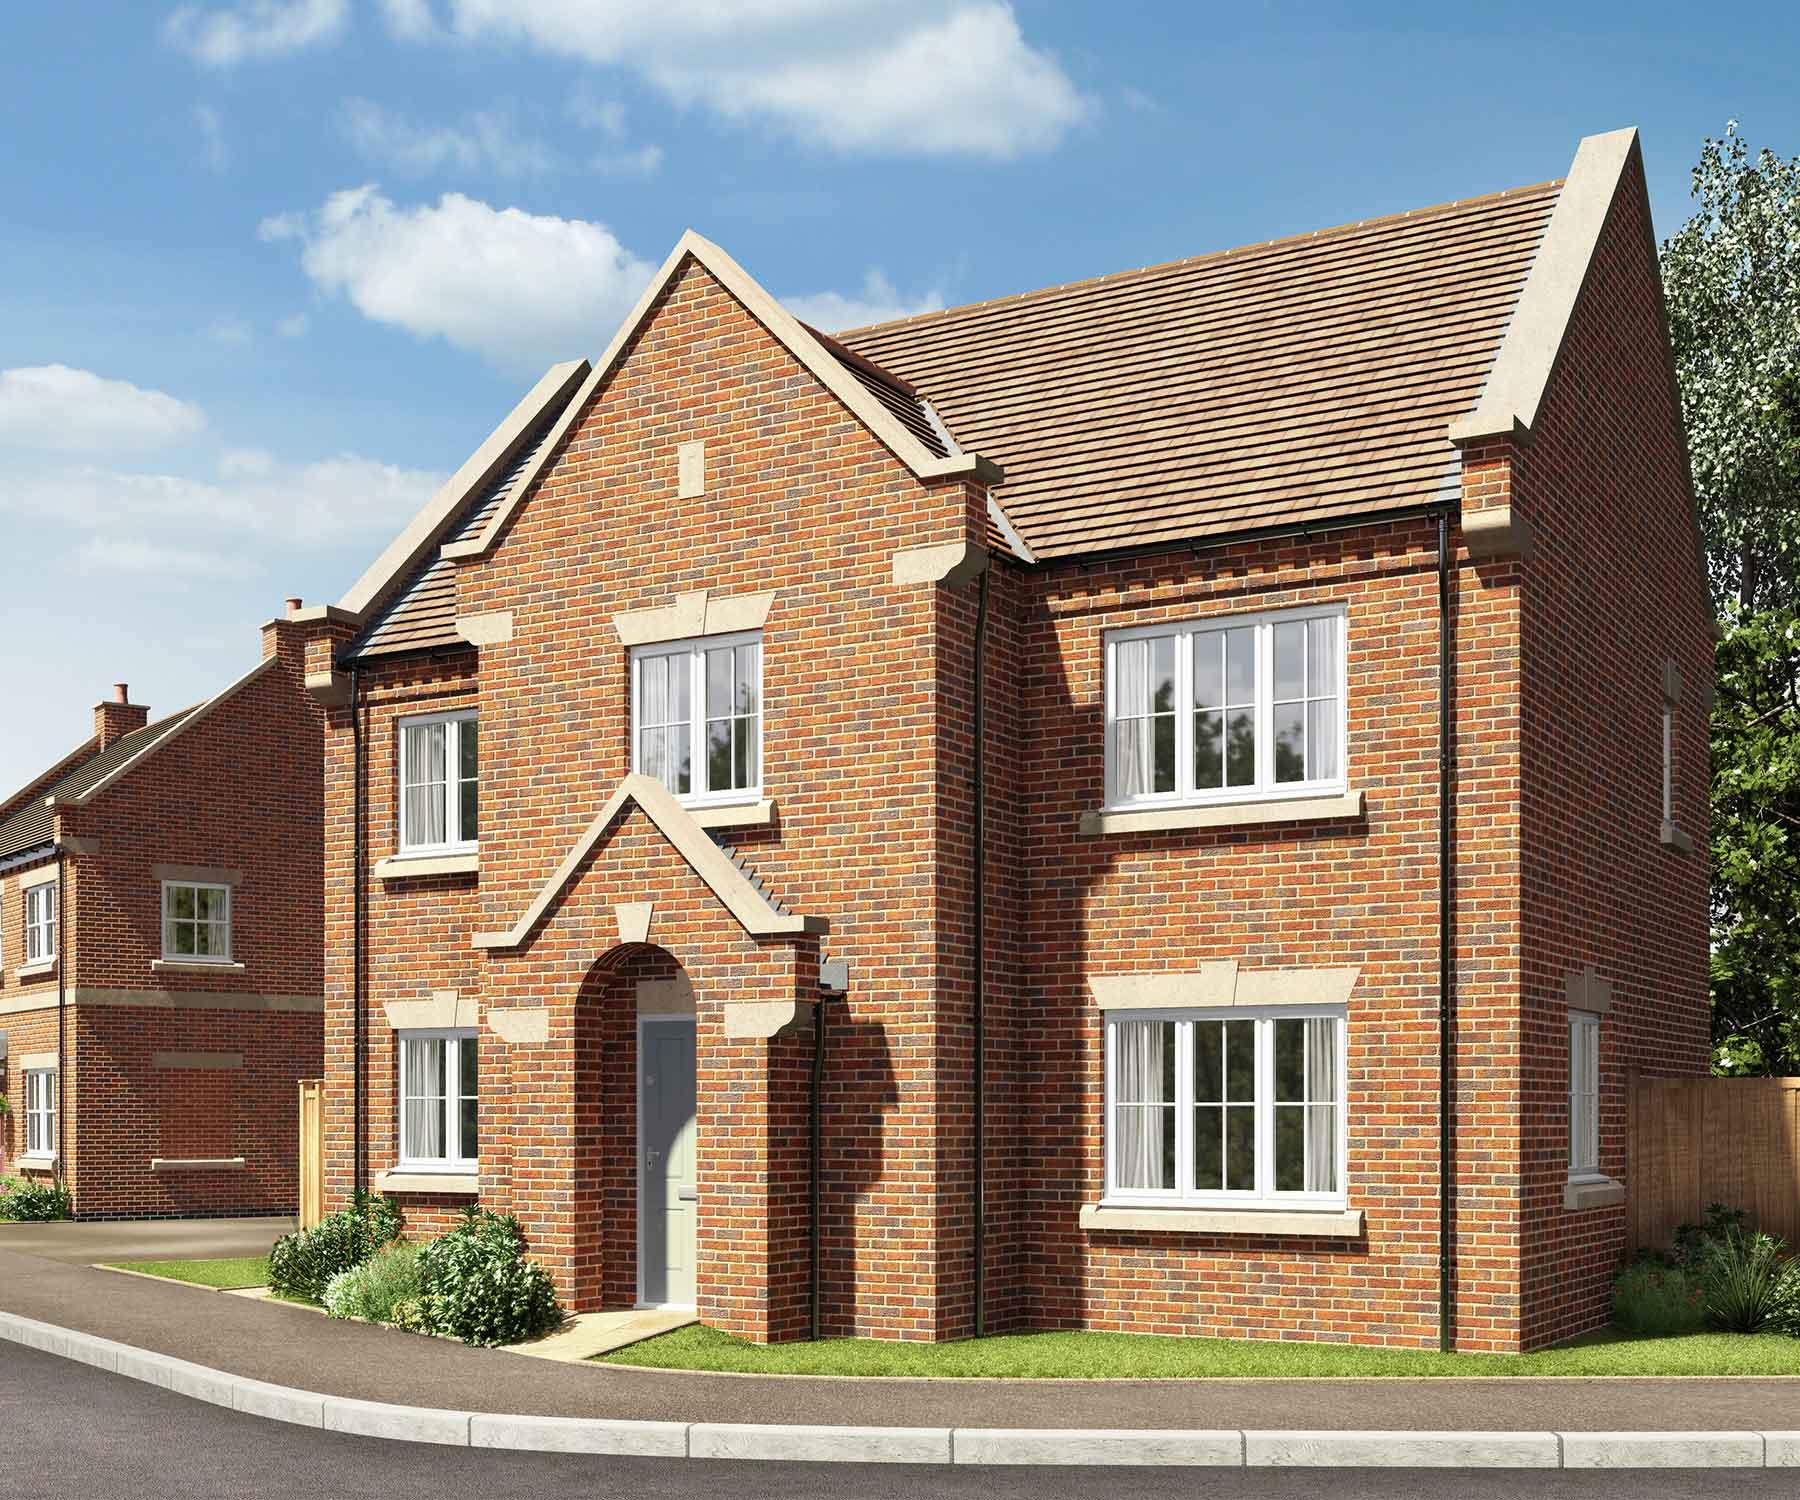 Grangewood - Smalley Manor